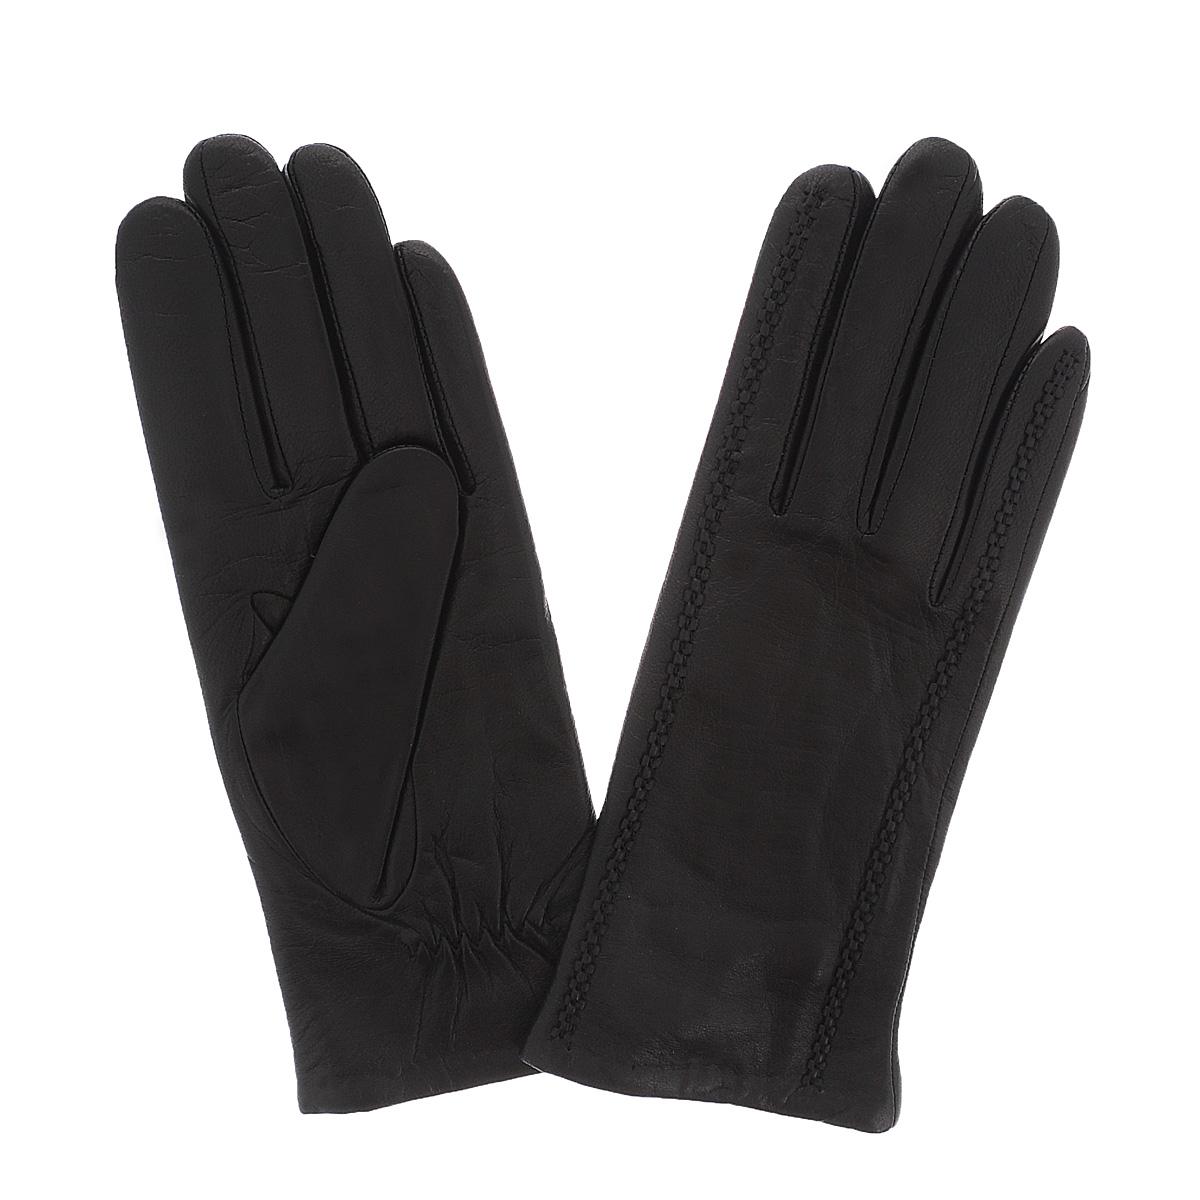 Перчатки женские Dali Exclusive, цвет: черный. 11_CAMBOLE/NEW. Размер 6,5 женские блузки и рубашки new 2015 hbkstop